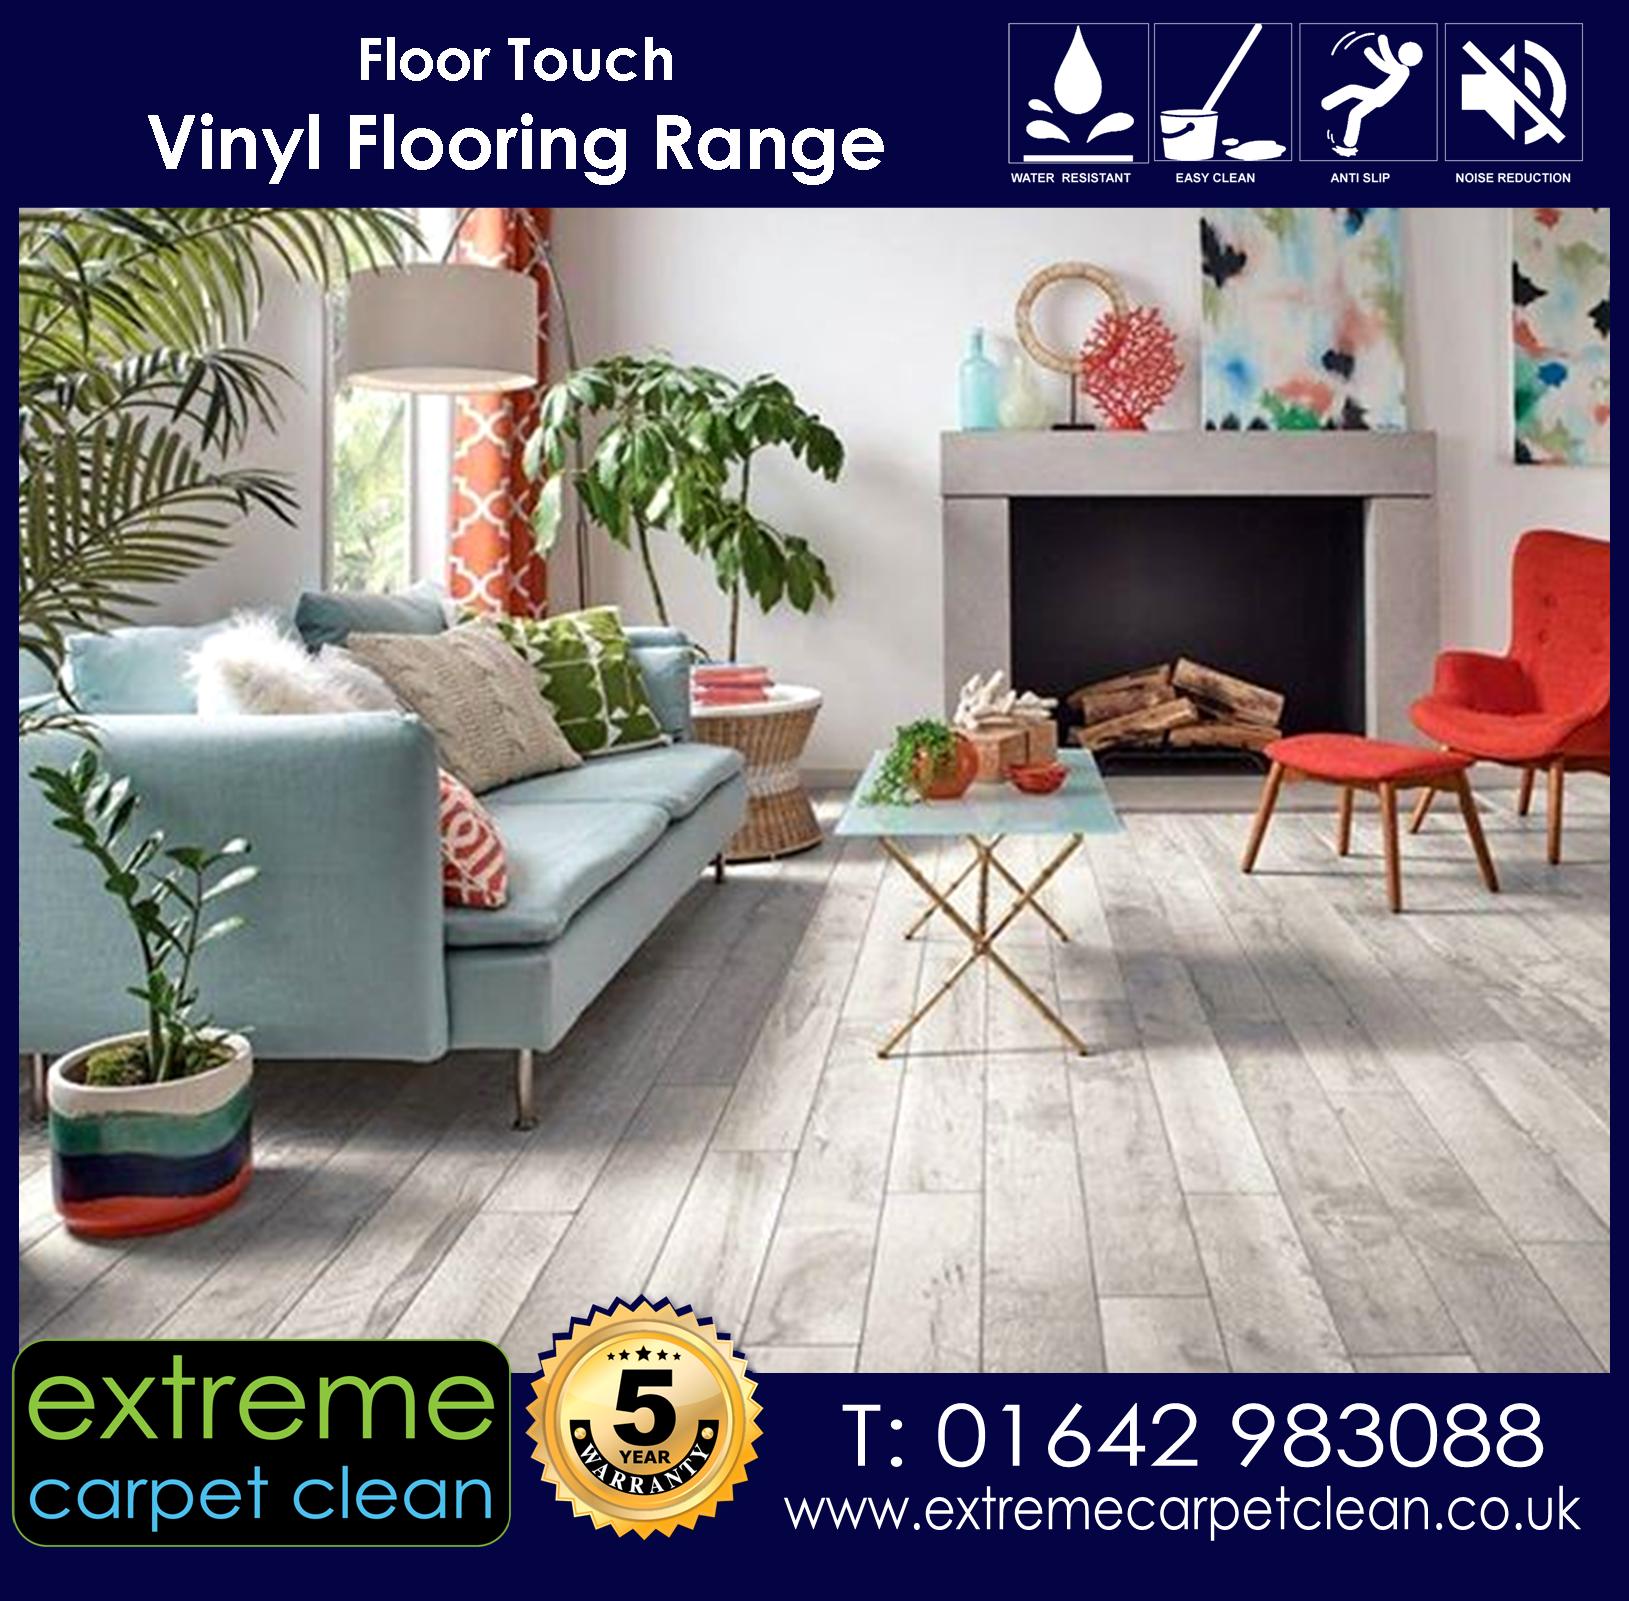 Extreme Carpet Clean -  Vinyl, cushion flooring range